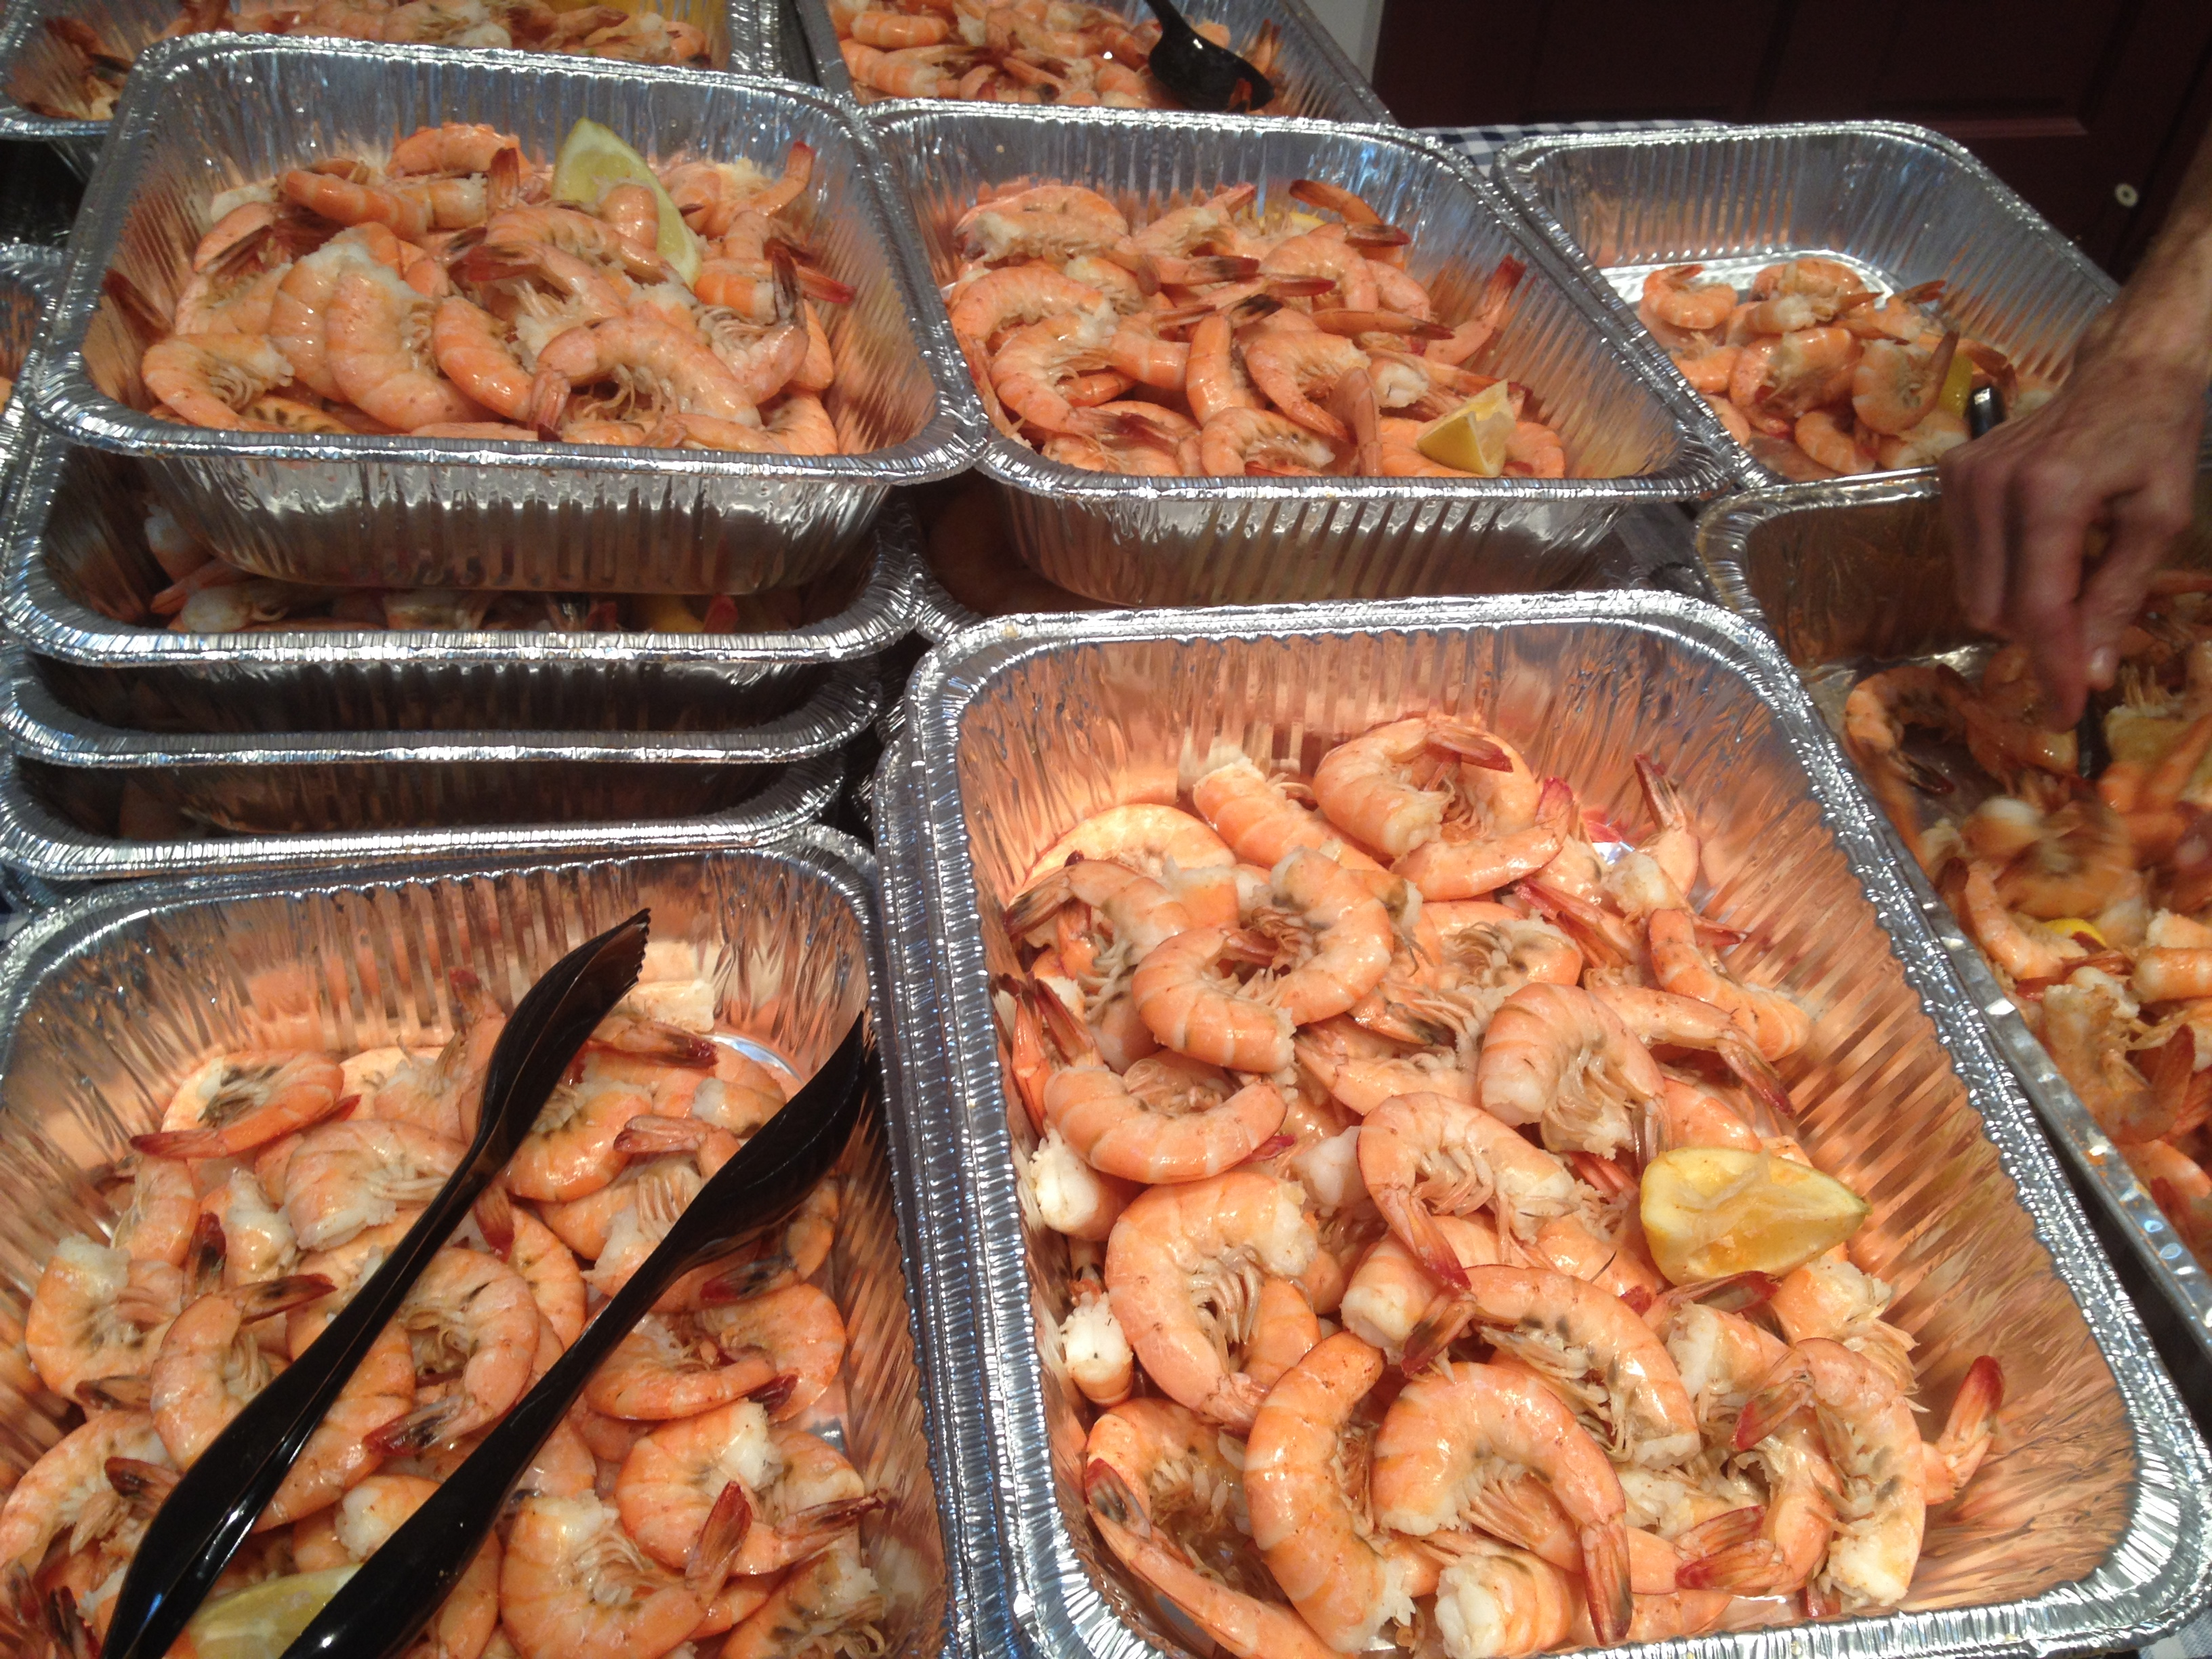 Basics to Hosting a Shrimp Boil to Raise Money and Awareness for Back Bay Mission